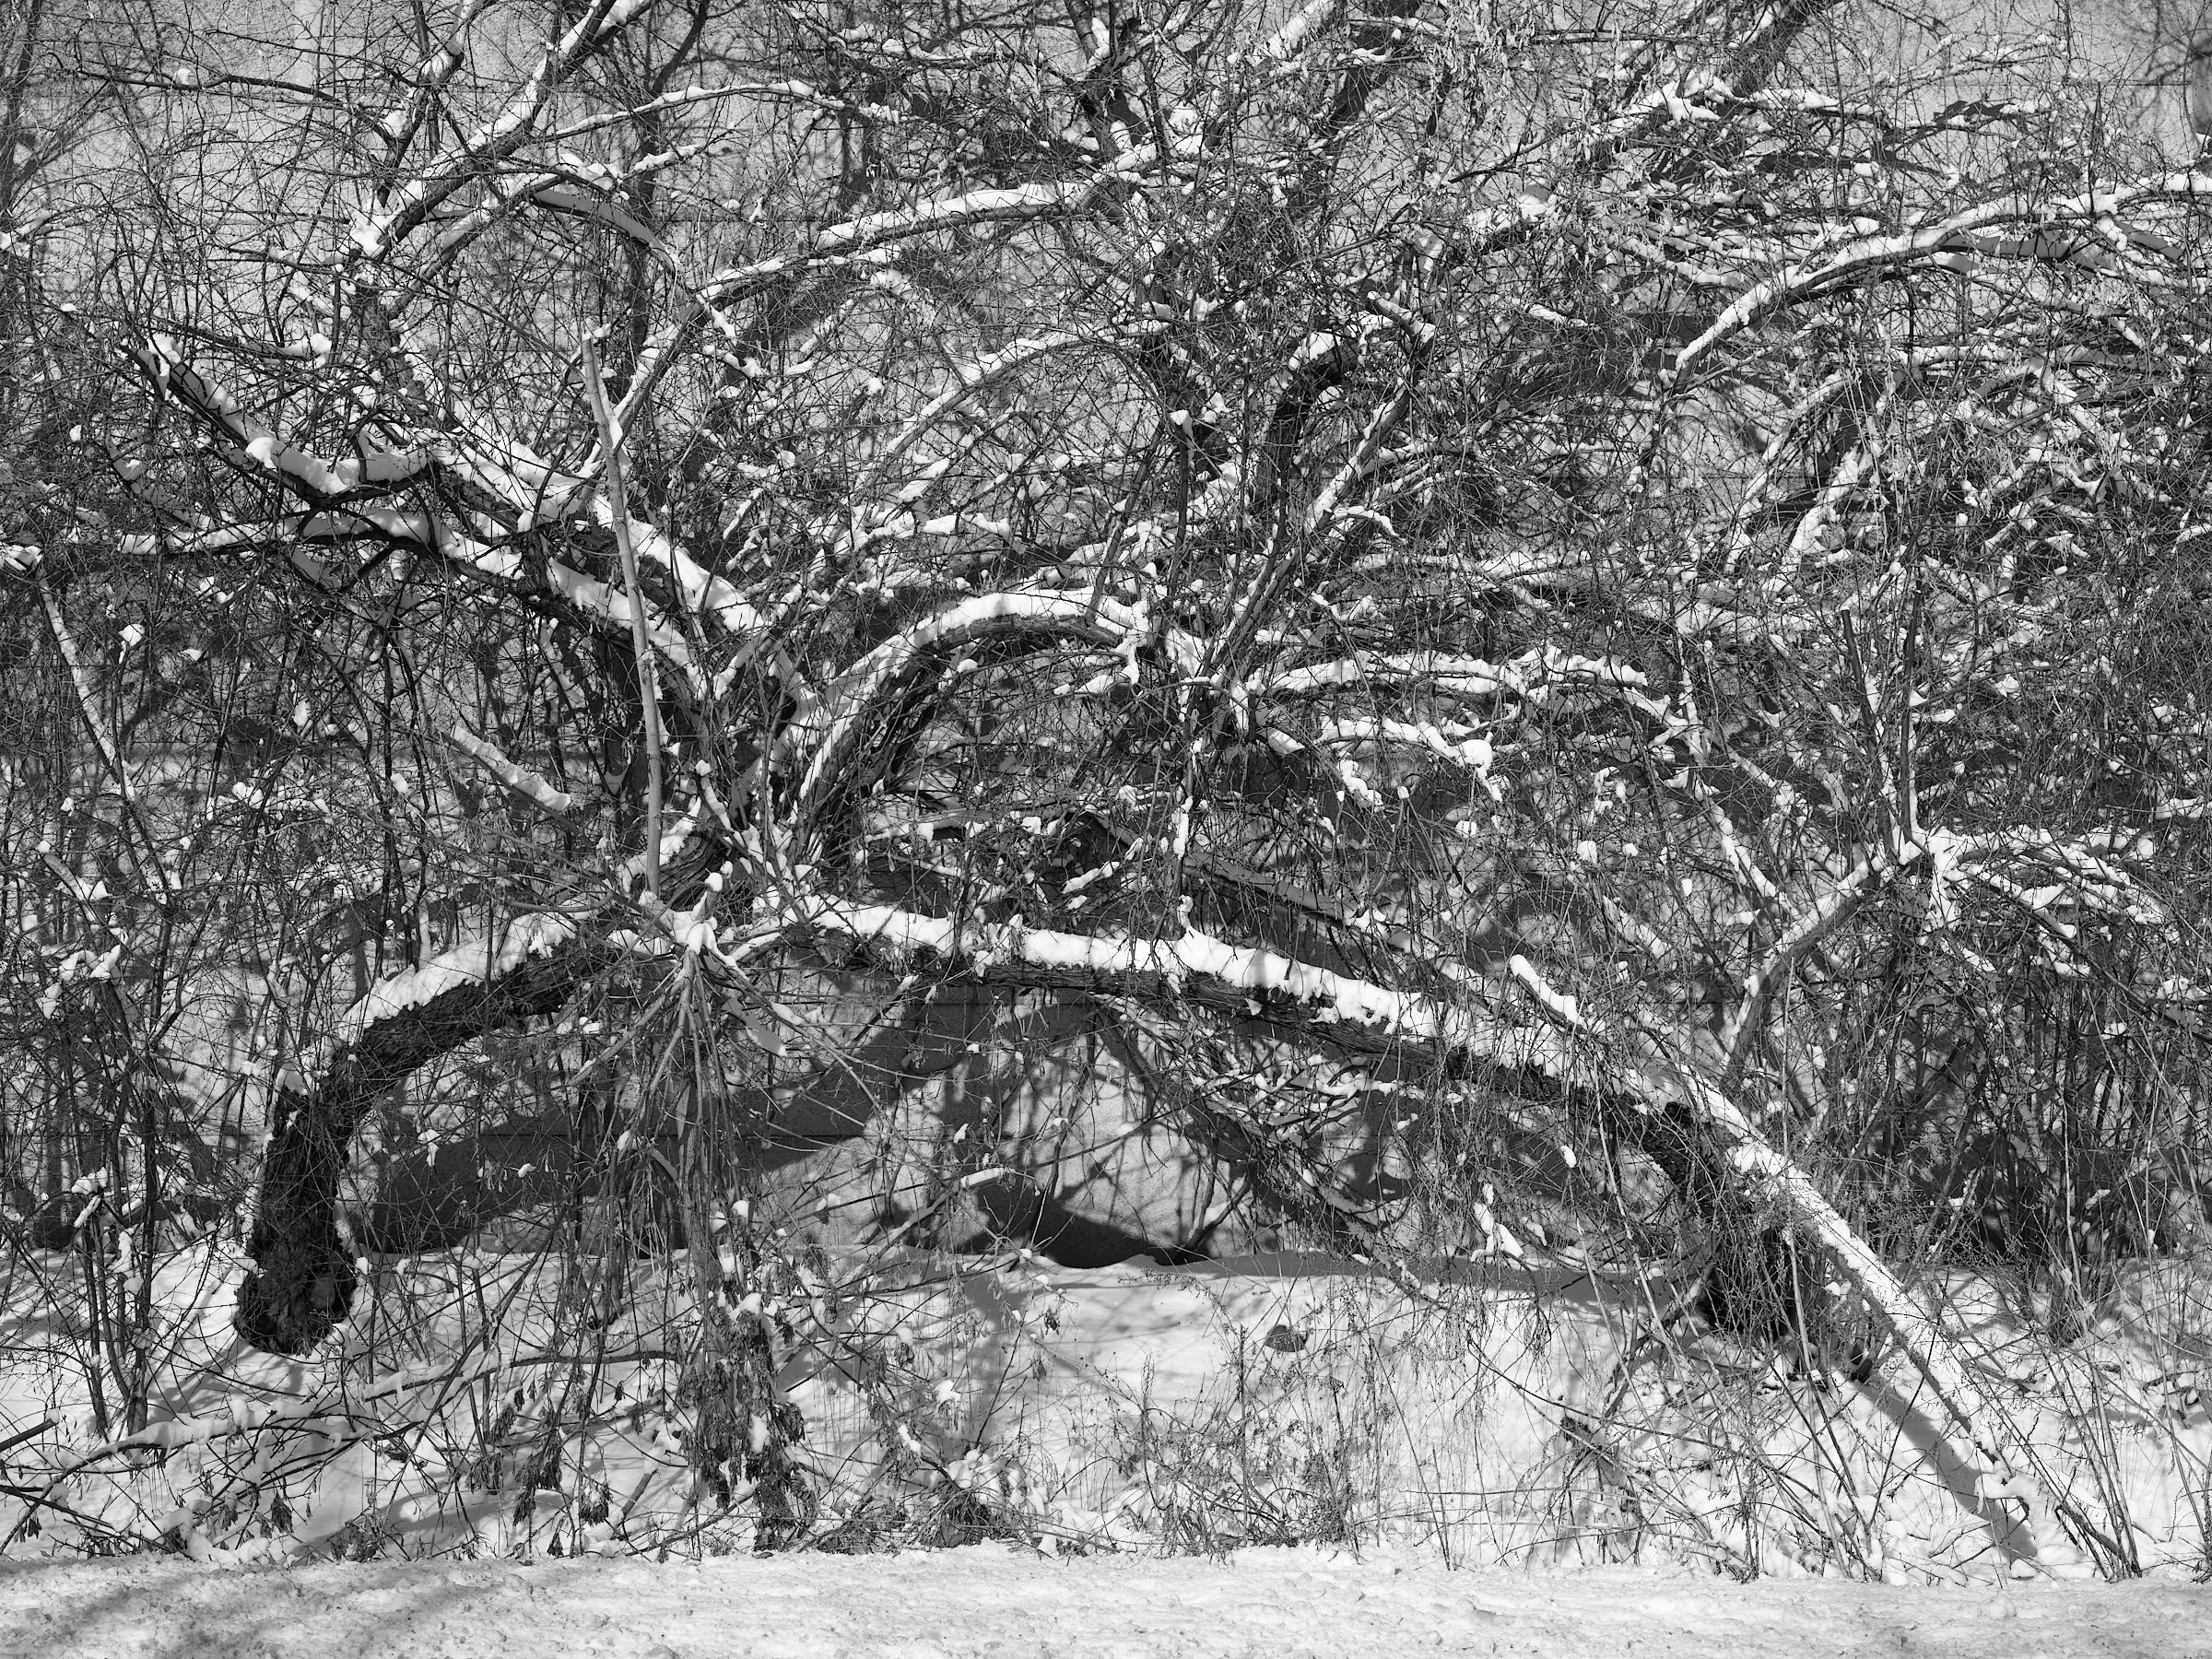 Snowy Shrubs, Mississauga, January 2018